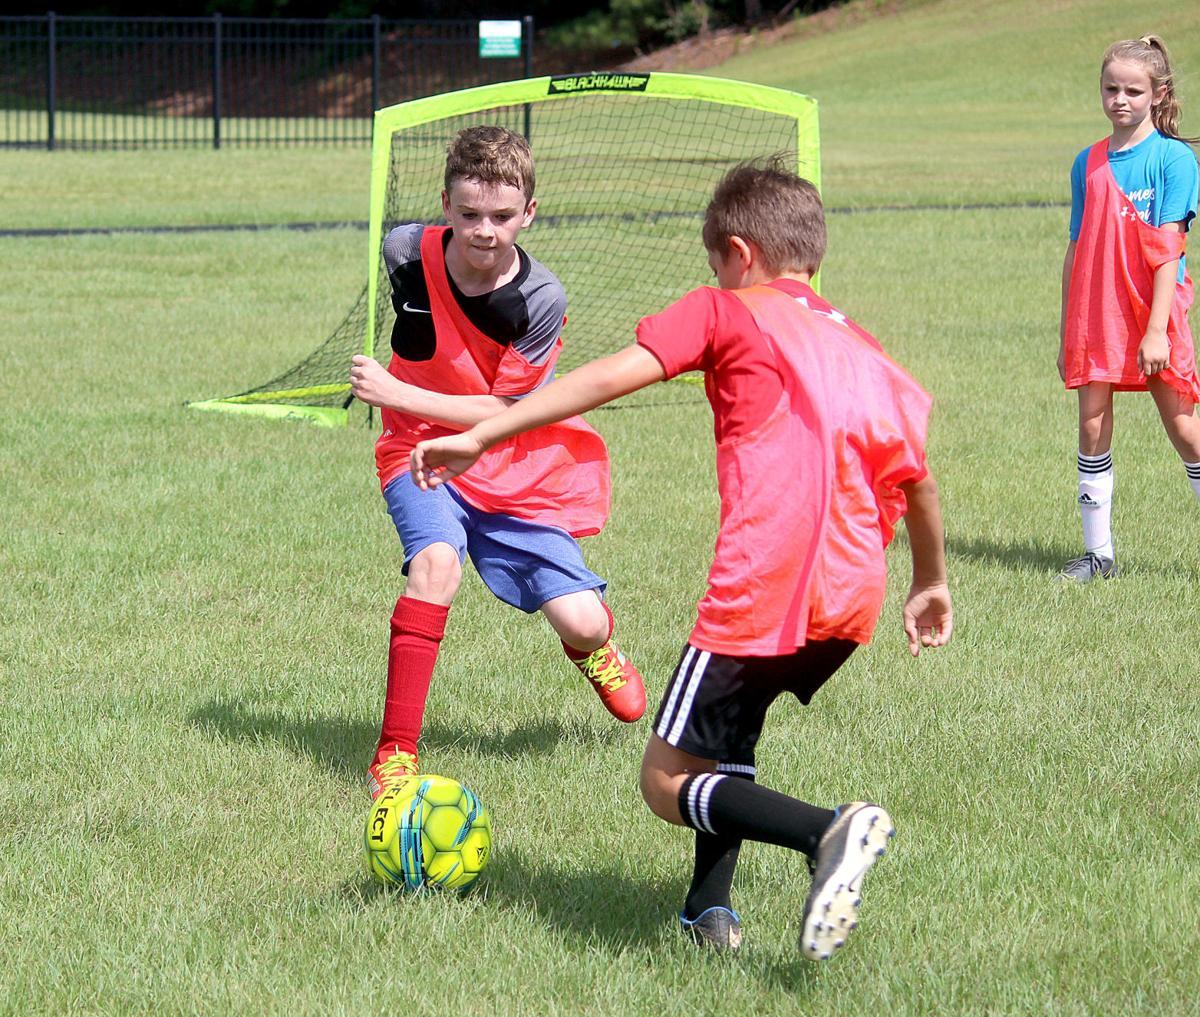 MCC soccer camp - Jack Hulbert